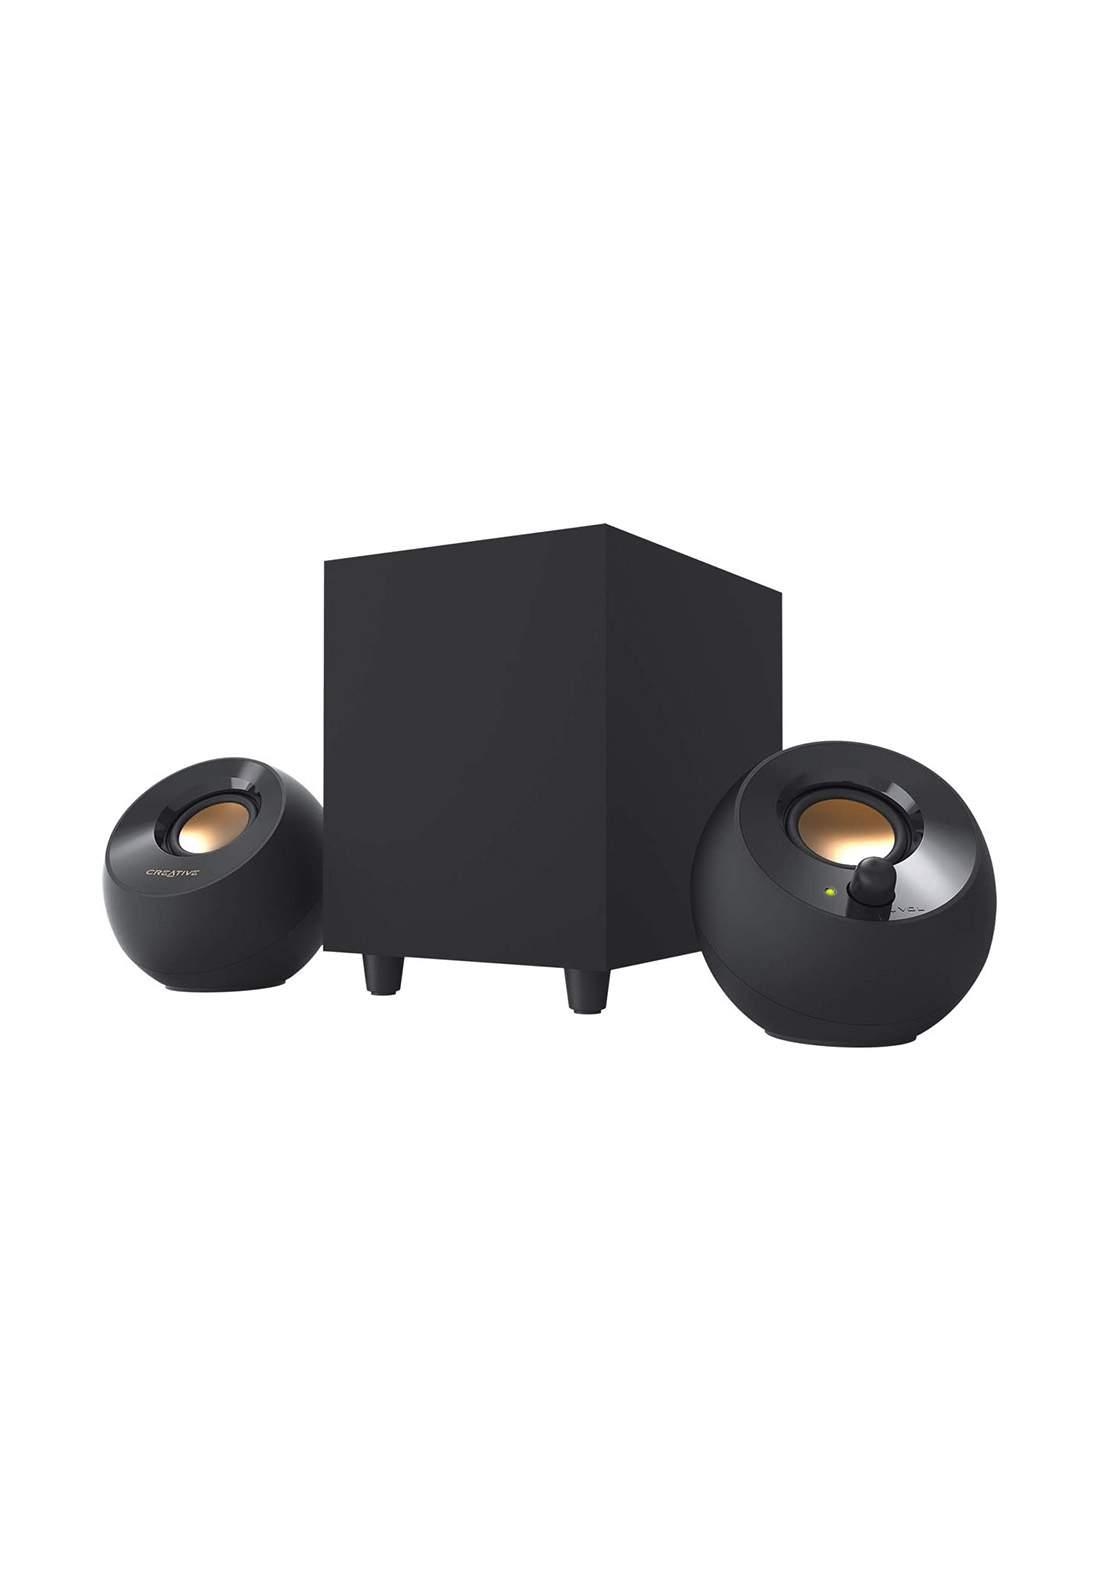 Creative Pebble Plus 2.1 USB Powered Desktop Speakers with Powerful Subwoofer - Black مكبر صوت